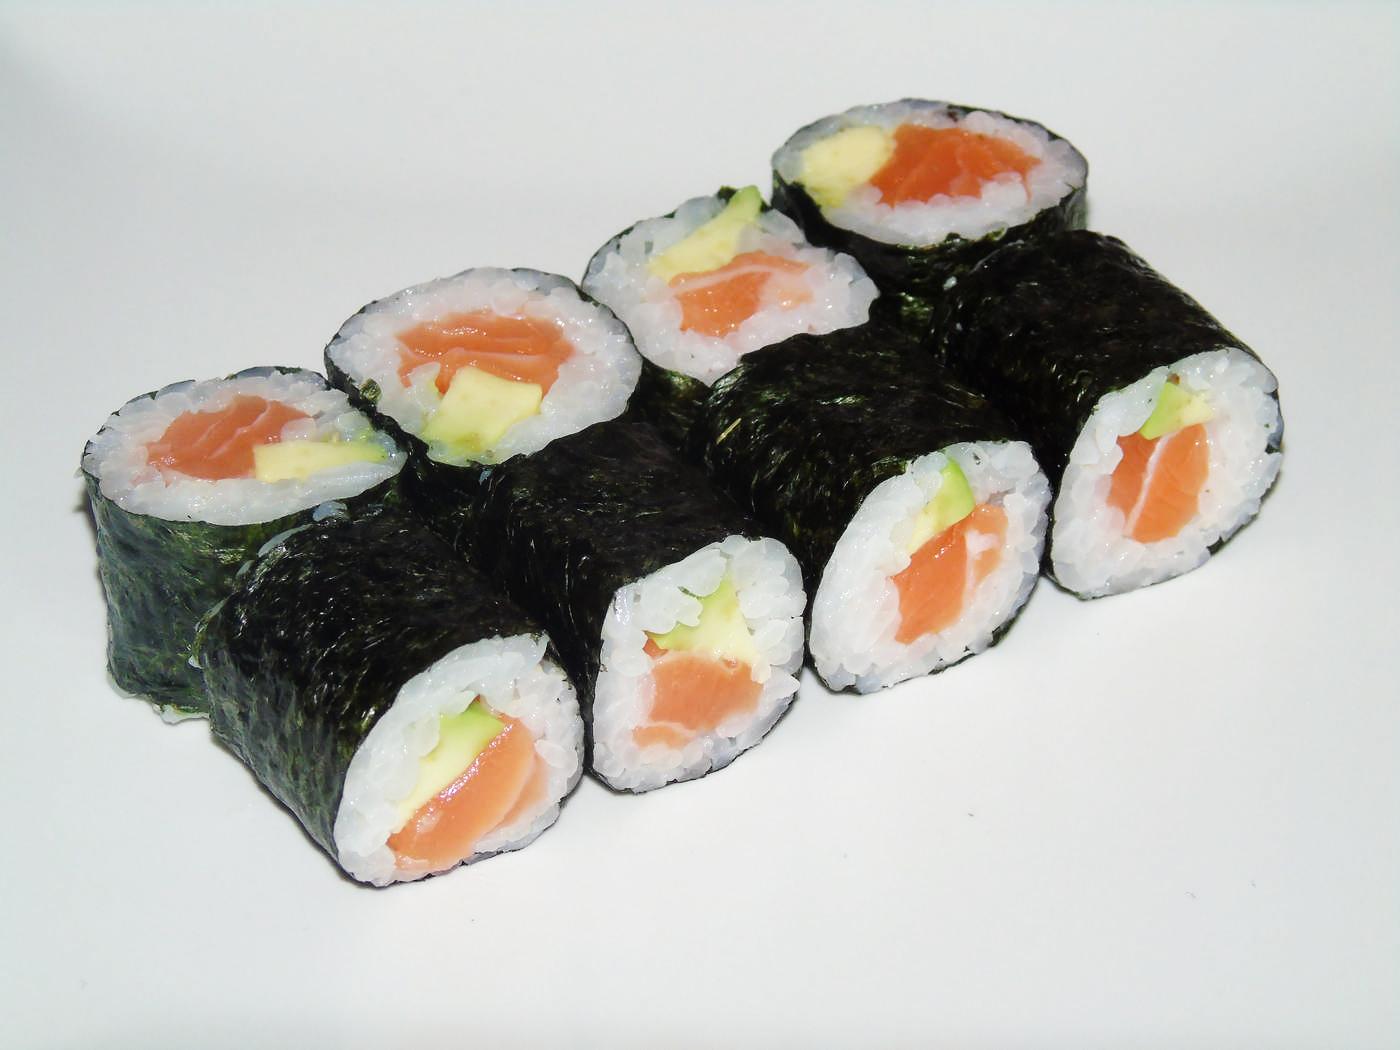 Hostomaki Salmon and Avocado 8 pcs